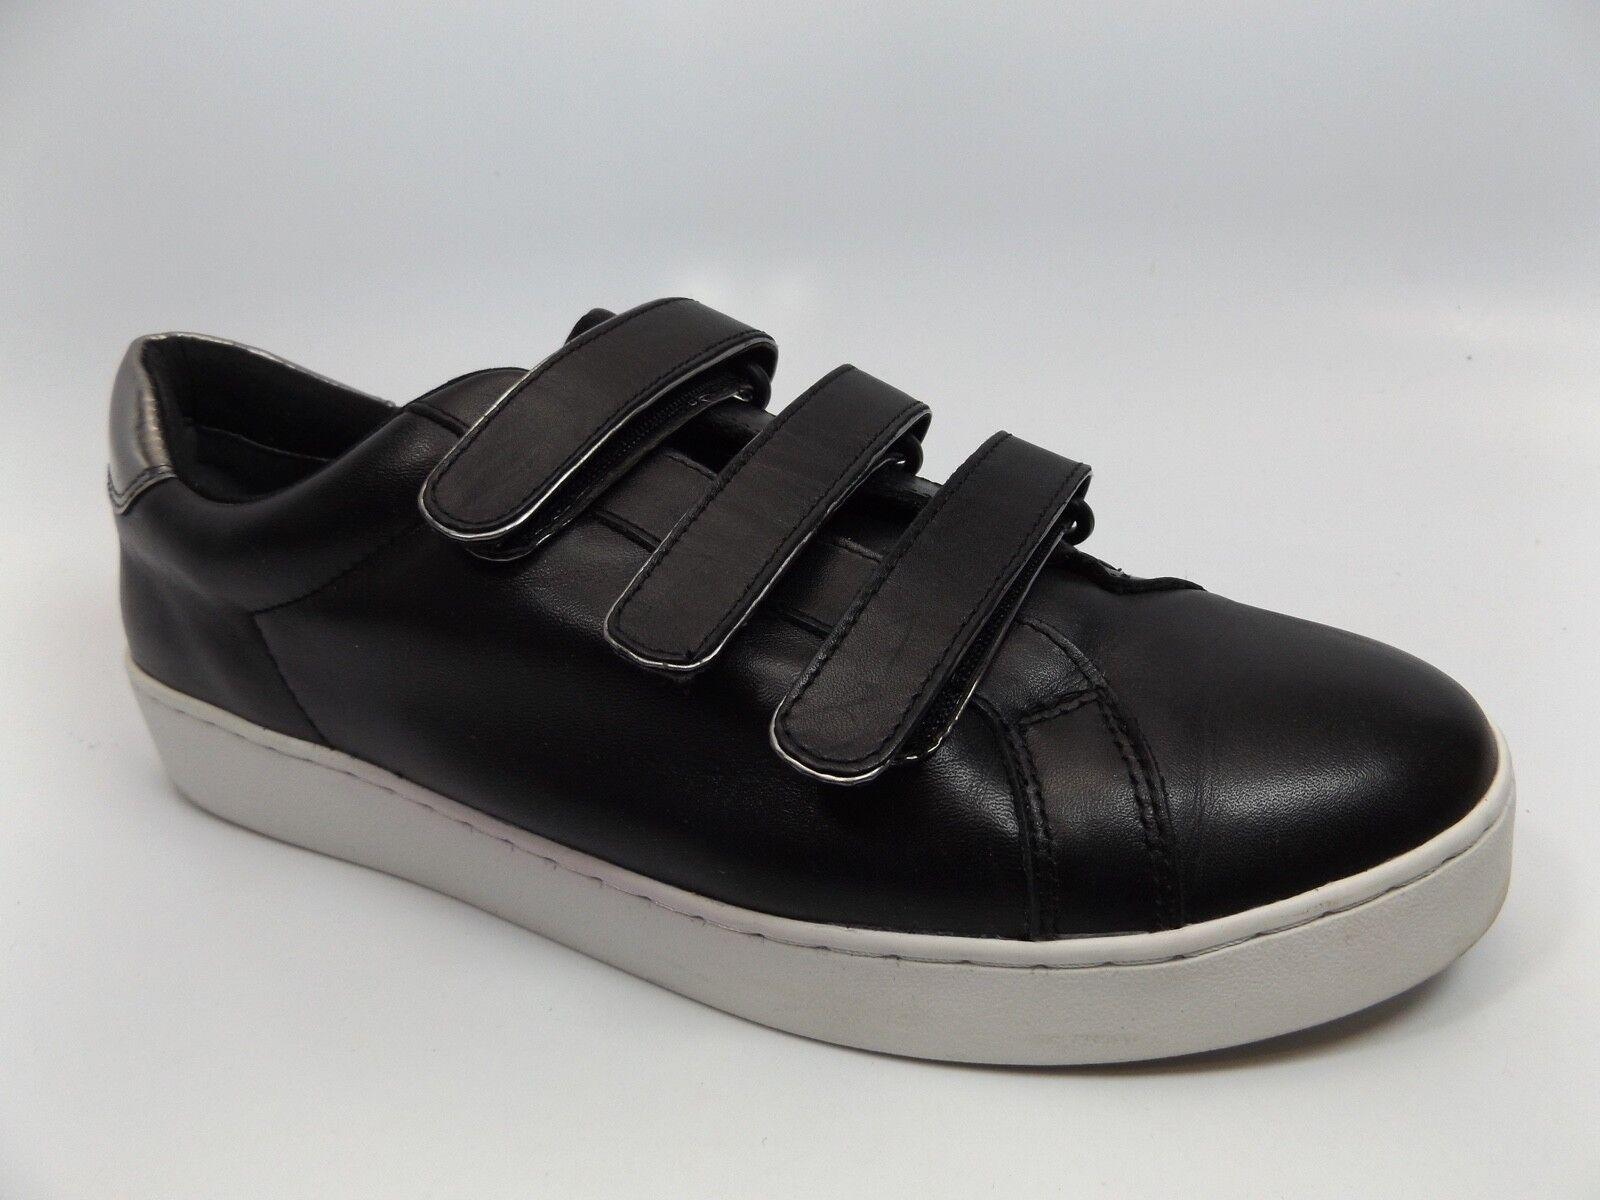 Vionic Orthaheel Orthaheel Orthaheel Technology Women's SZ 10.0 M Bobbi Black Leather Sneakers D9674 244762